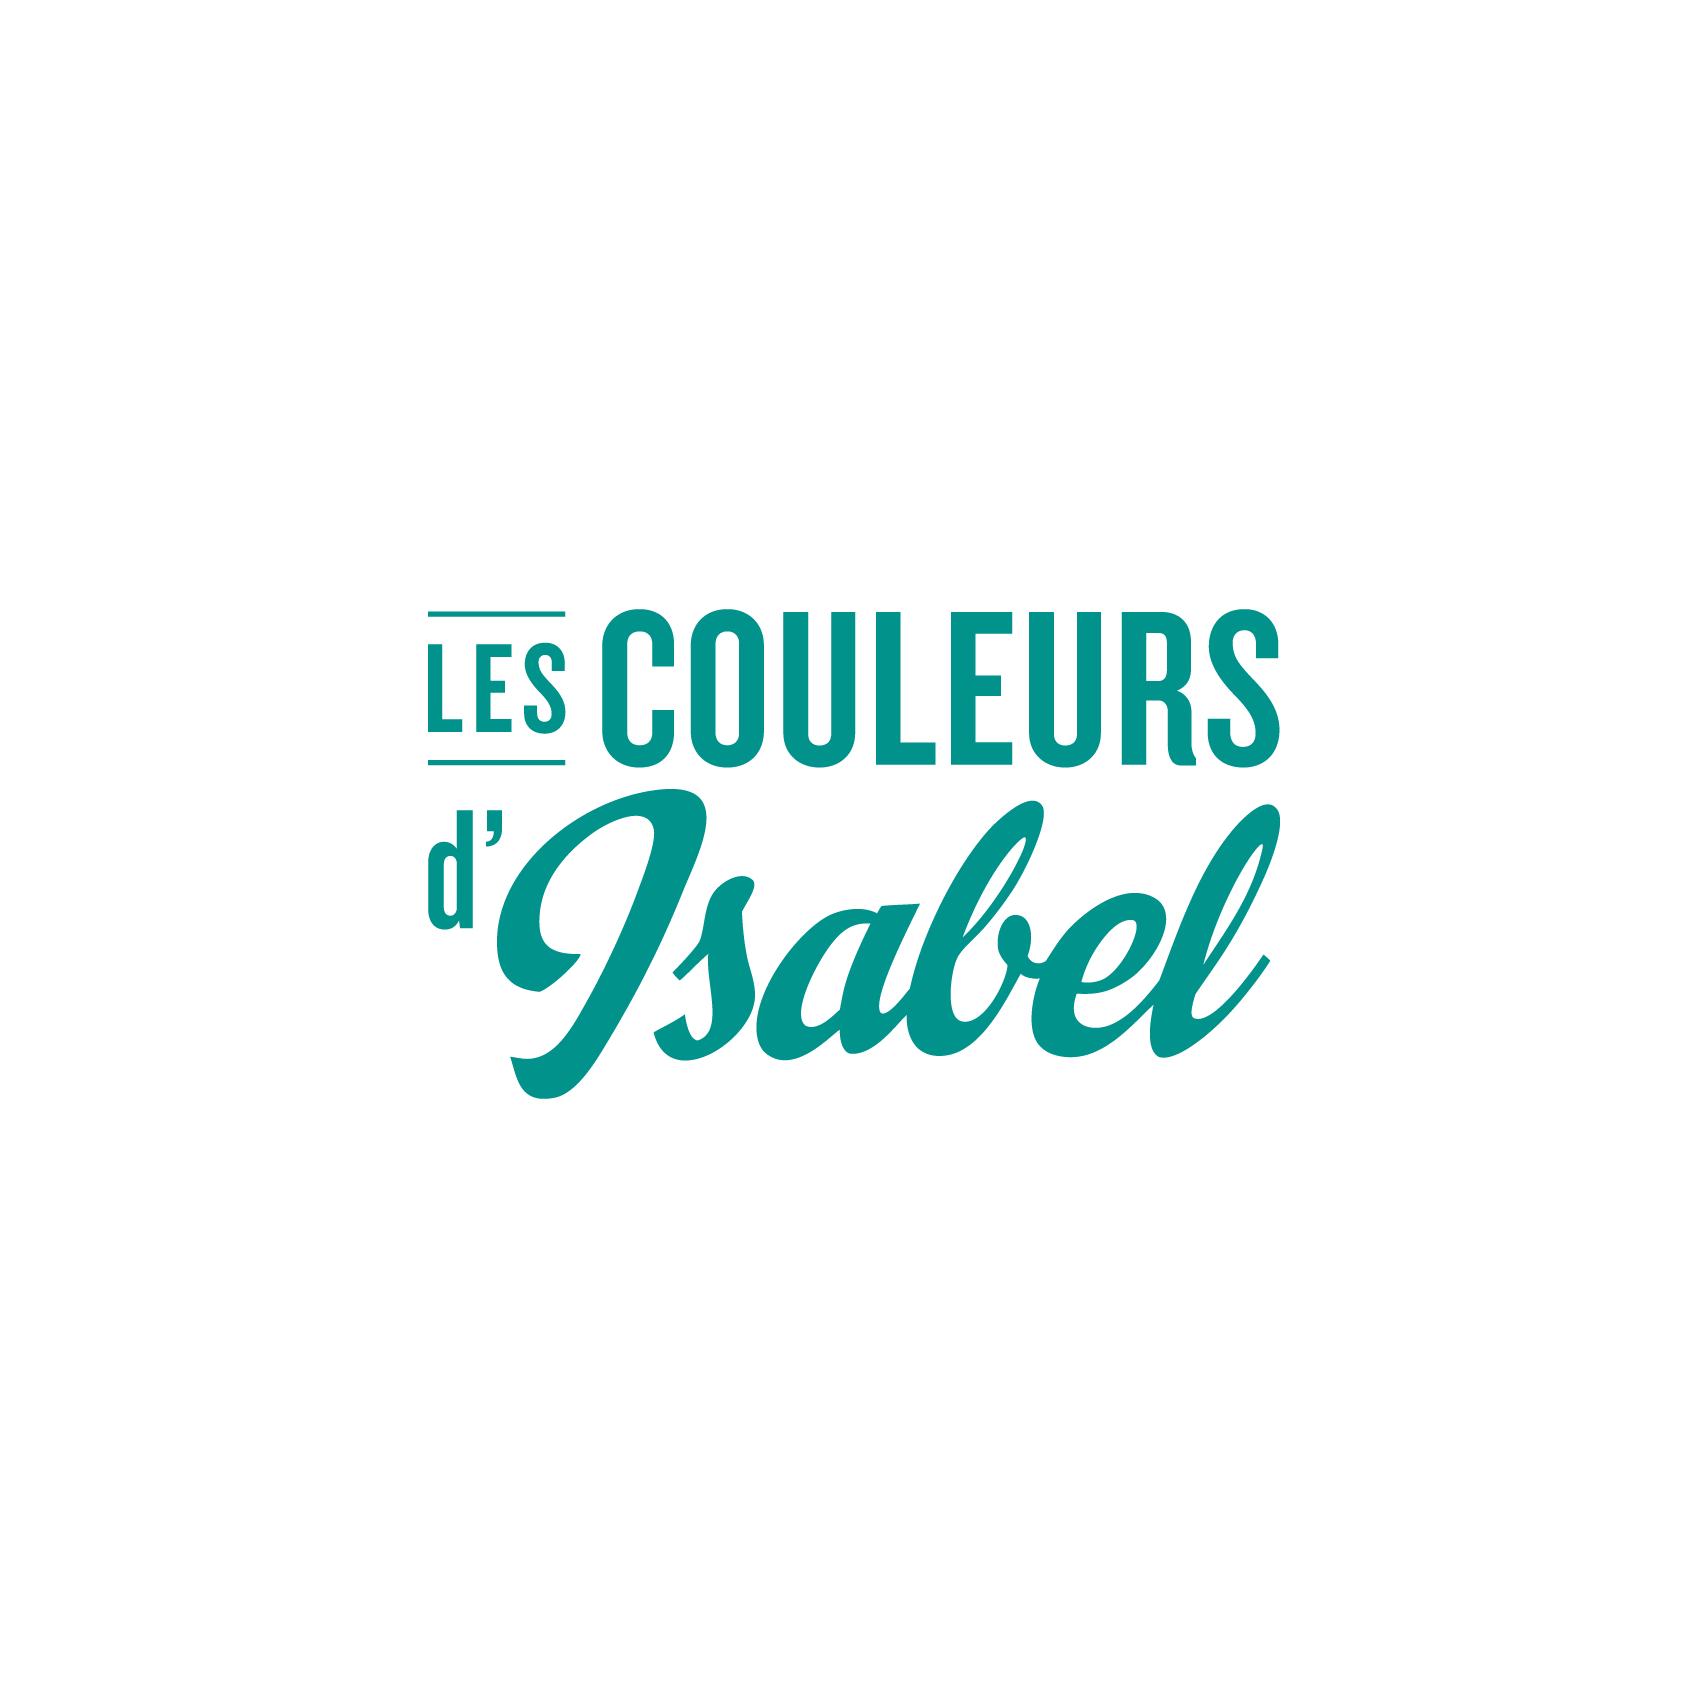 MlleRouge_logos_LesCouleursdIsabel